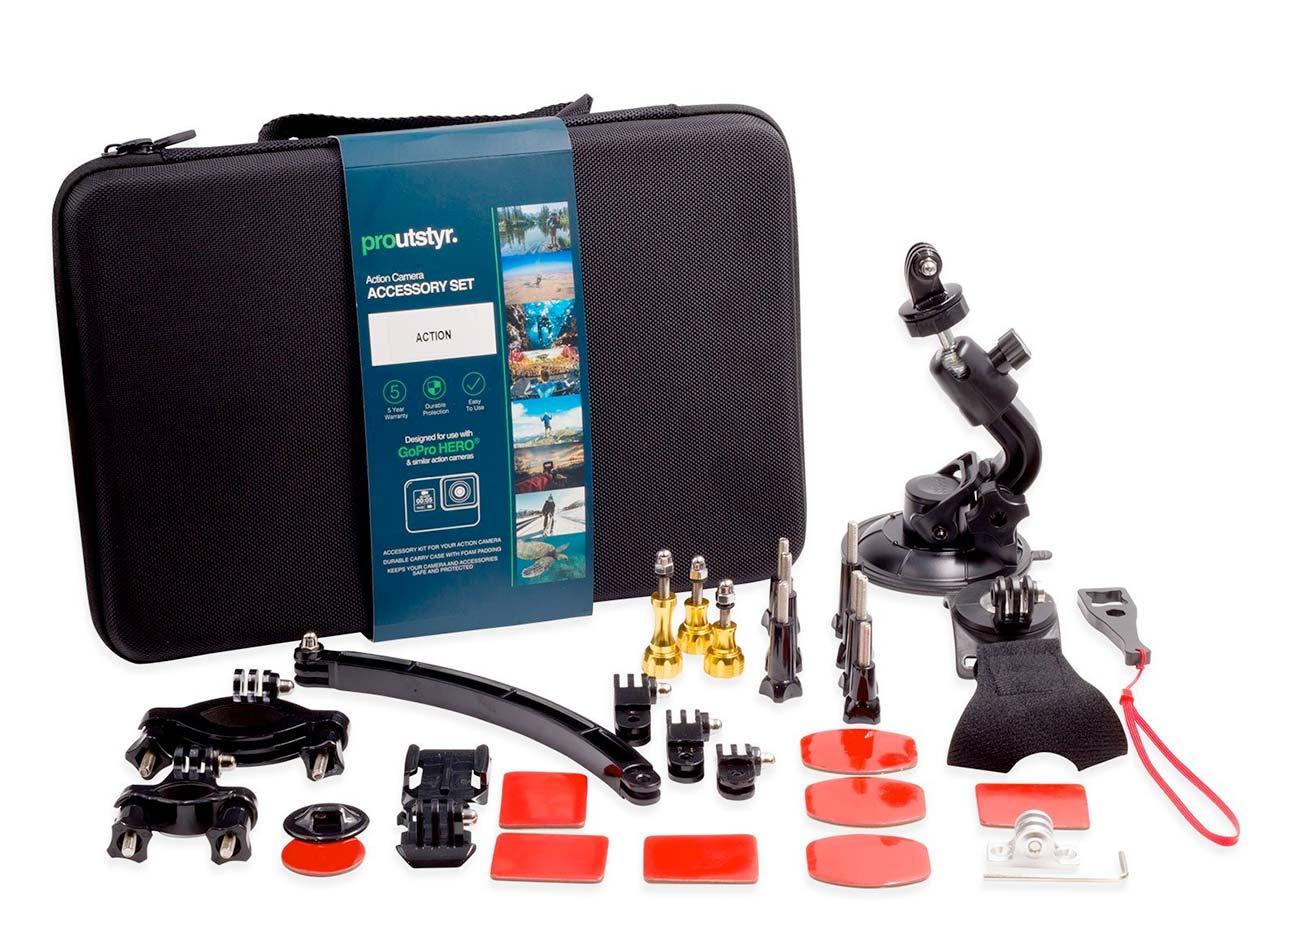 Action camera accessory set